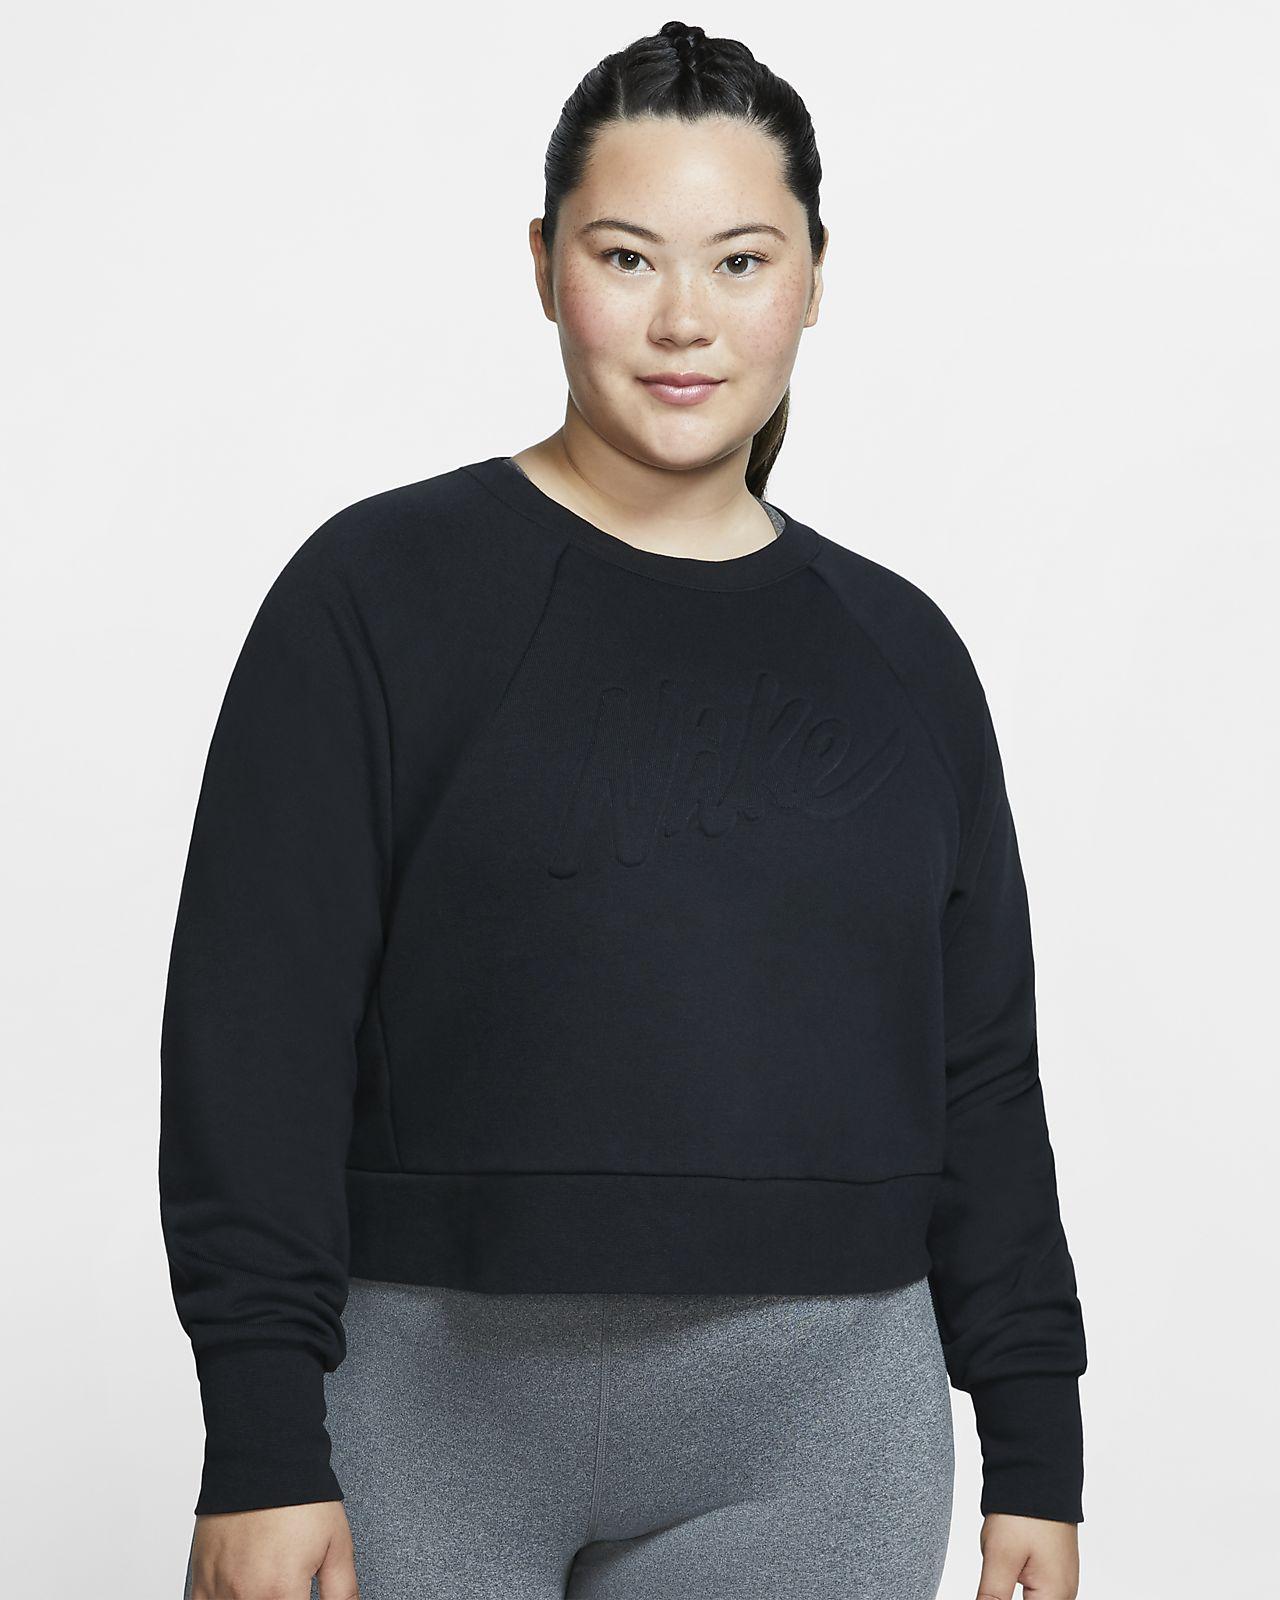 Nike Dri-FIT Women's Long-Sleeve Training Top (Plus Size)